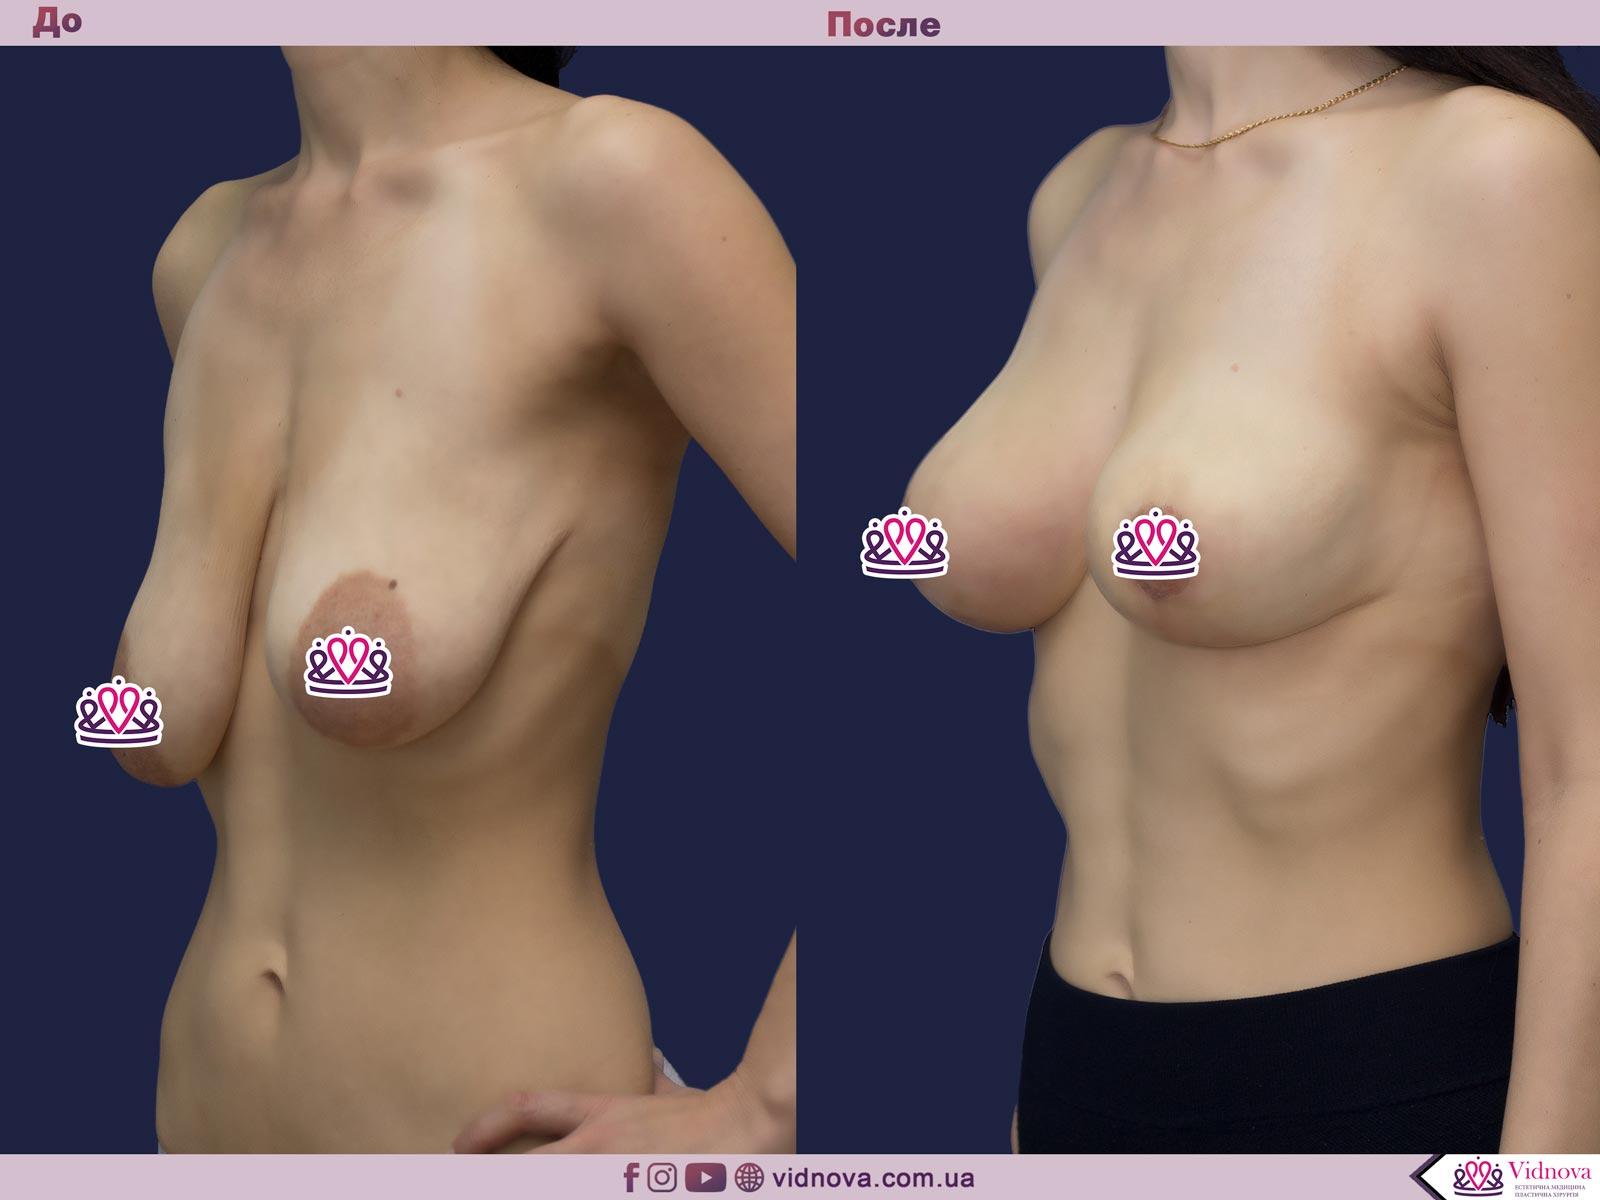 Подтяжка груди: Фото ДО и ПОСЛЕ - Пример №26-2 - Клиника Vidnova